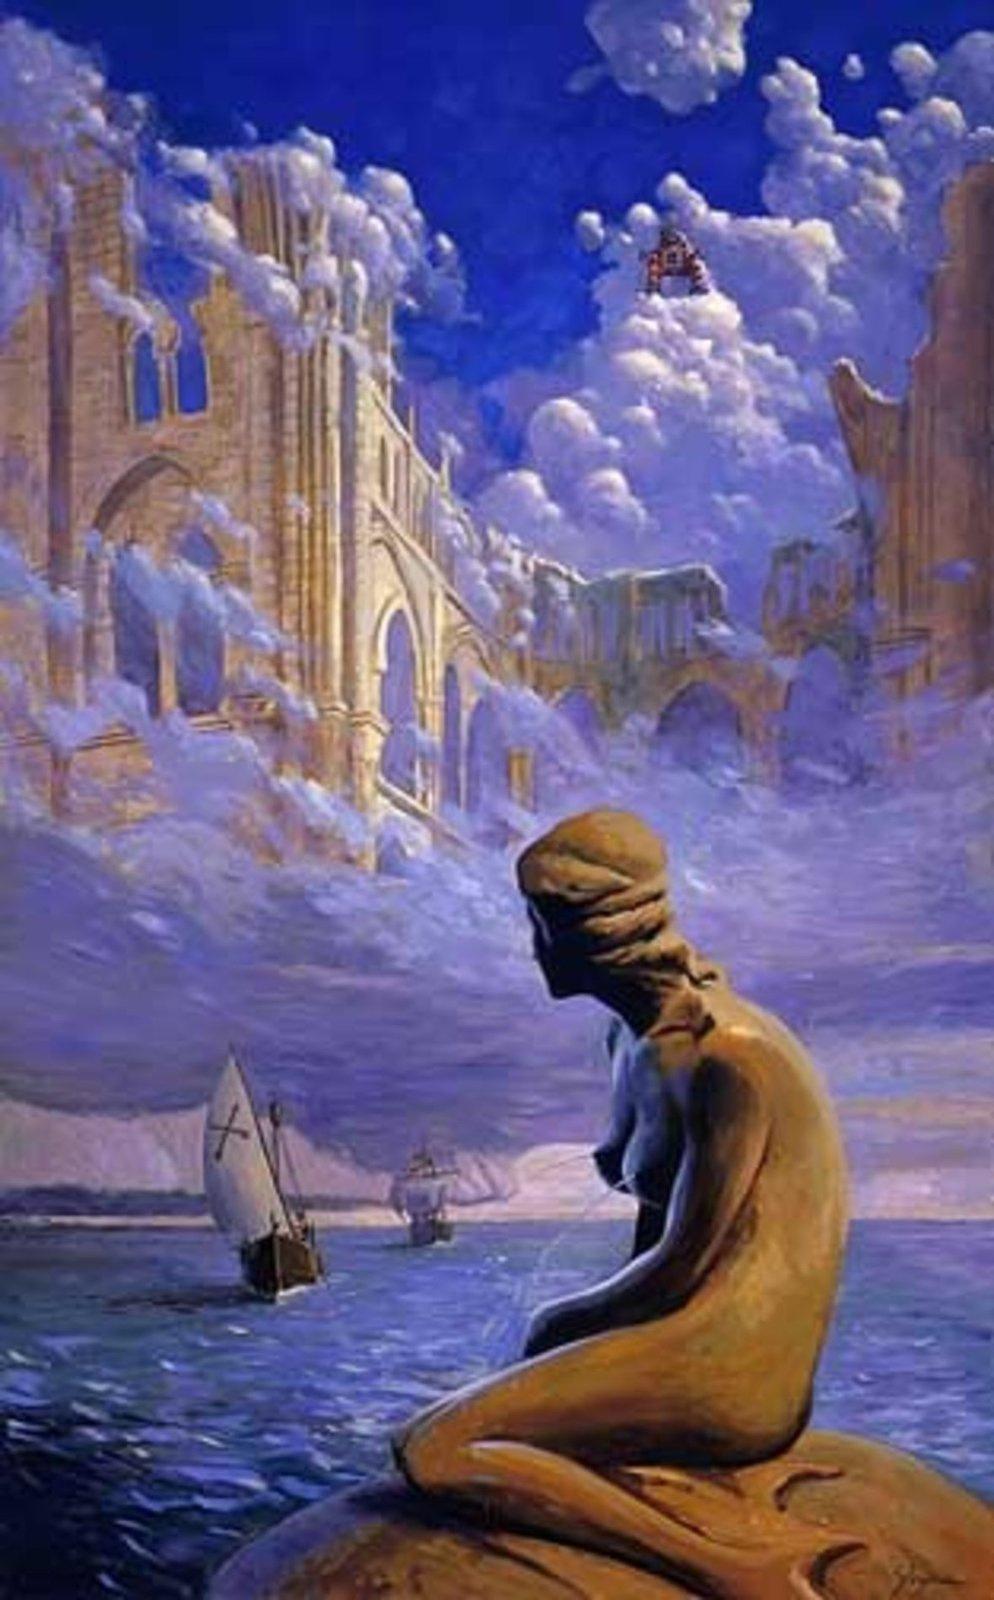 Eric Joyner. THE BECKONING OF THE SIREN